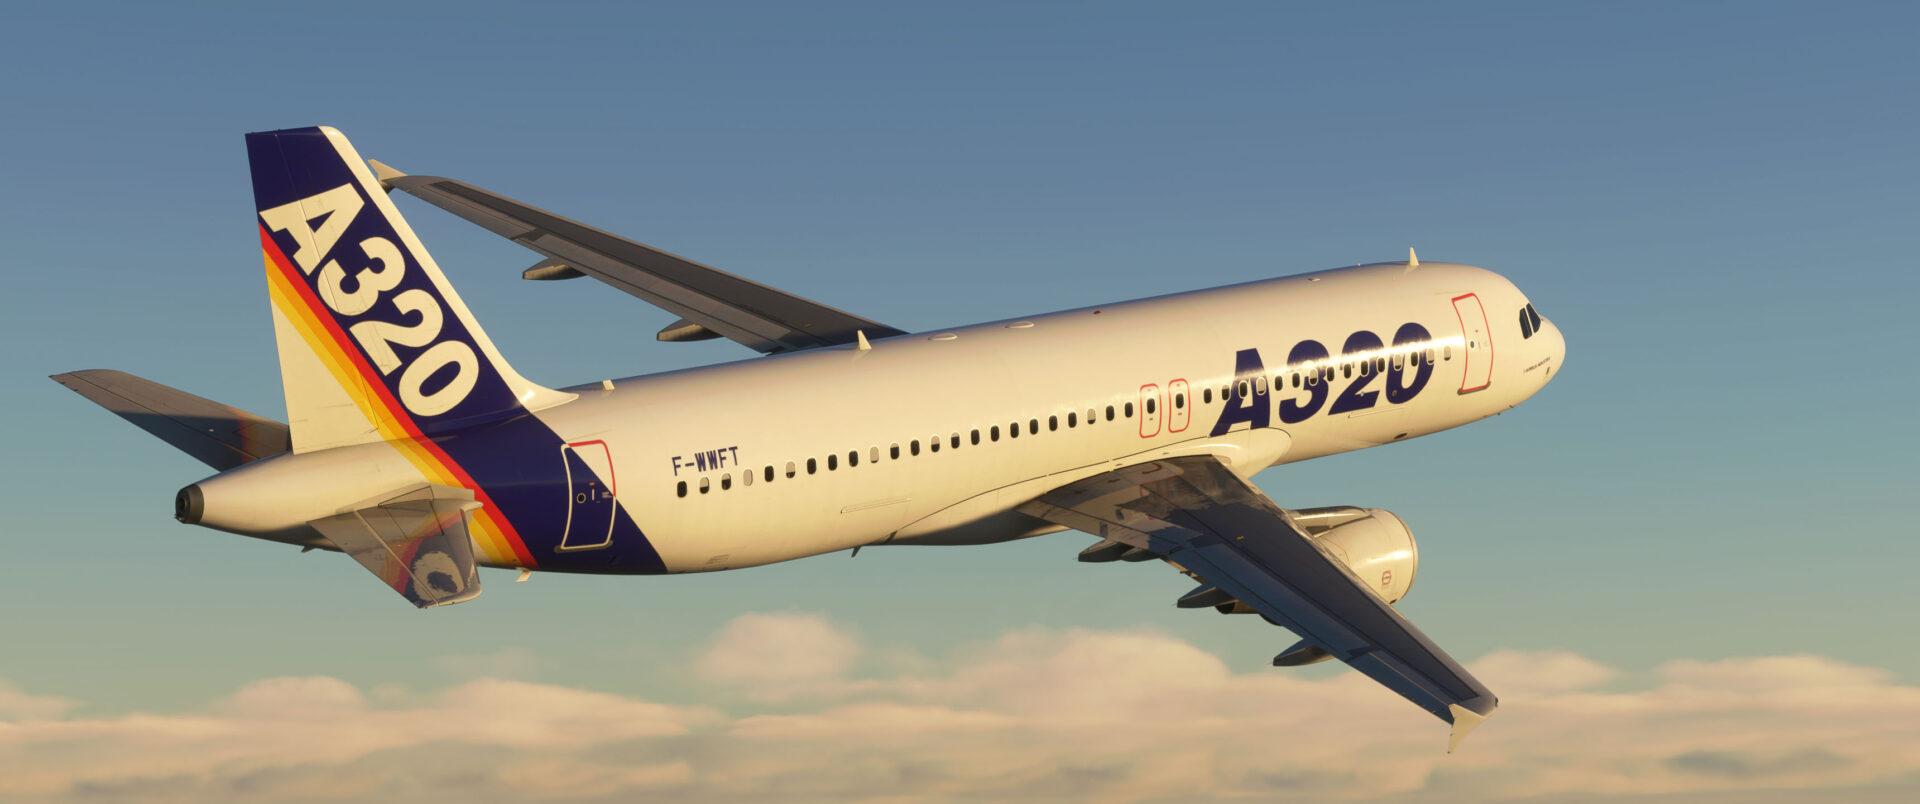 Microsoft Flight Simulator Fenix